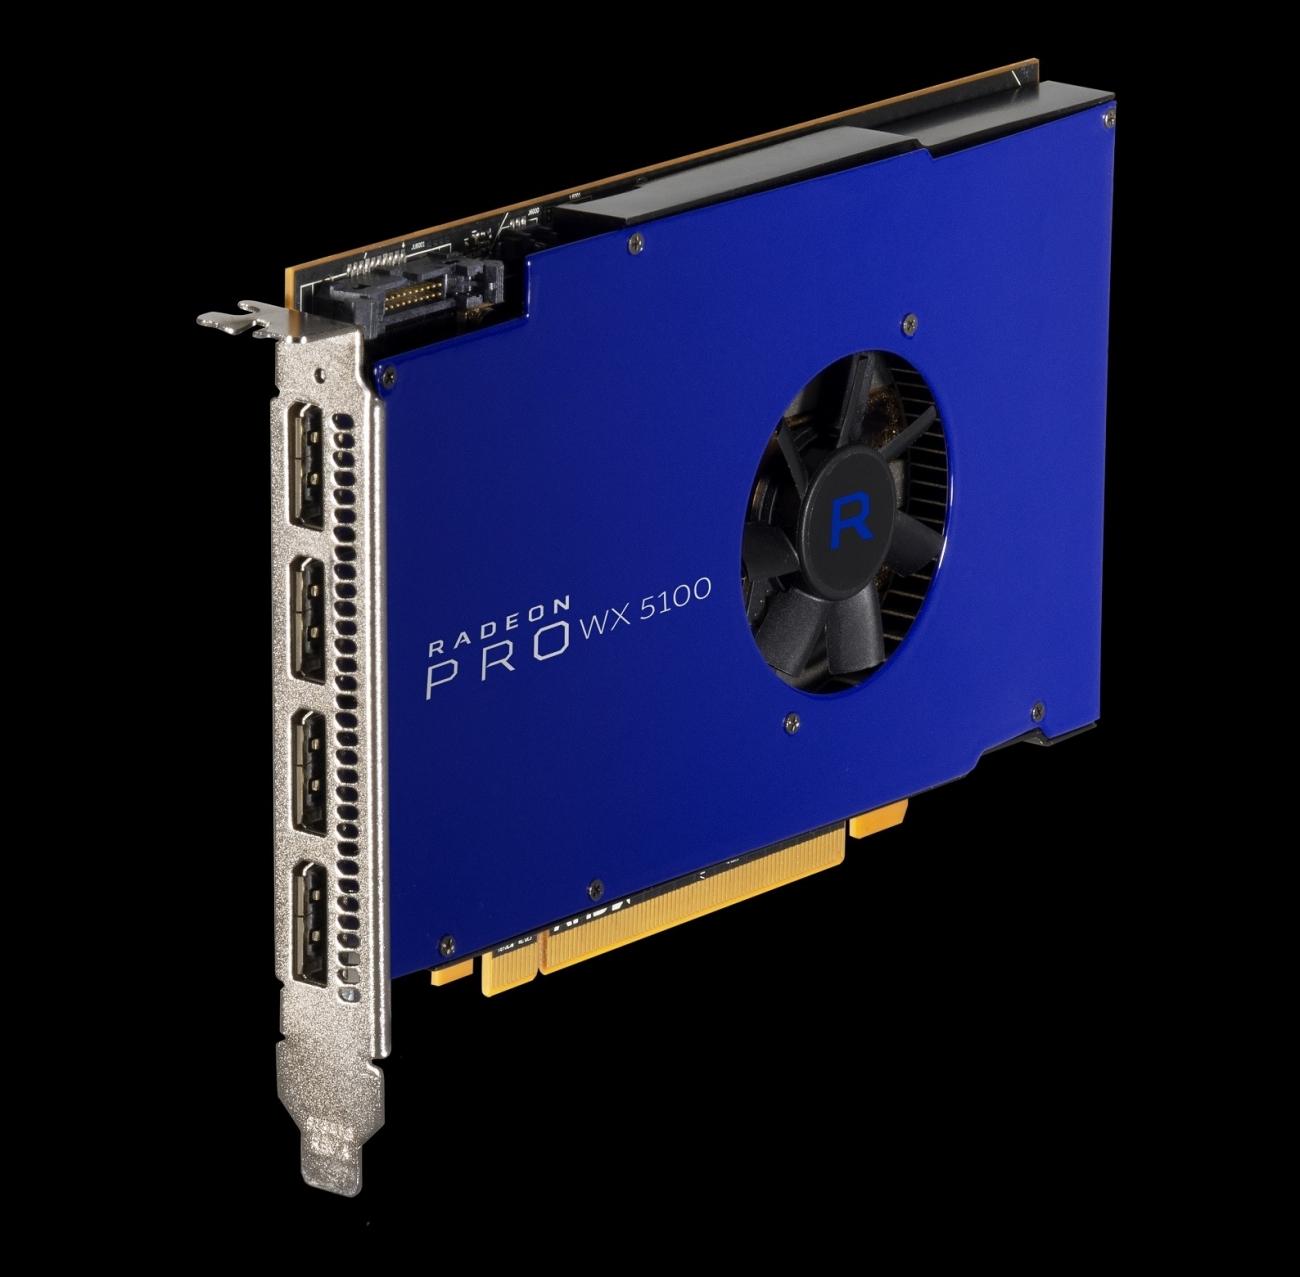 amd-radeon-pro-wx-5100-graphics-card